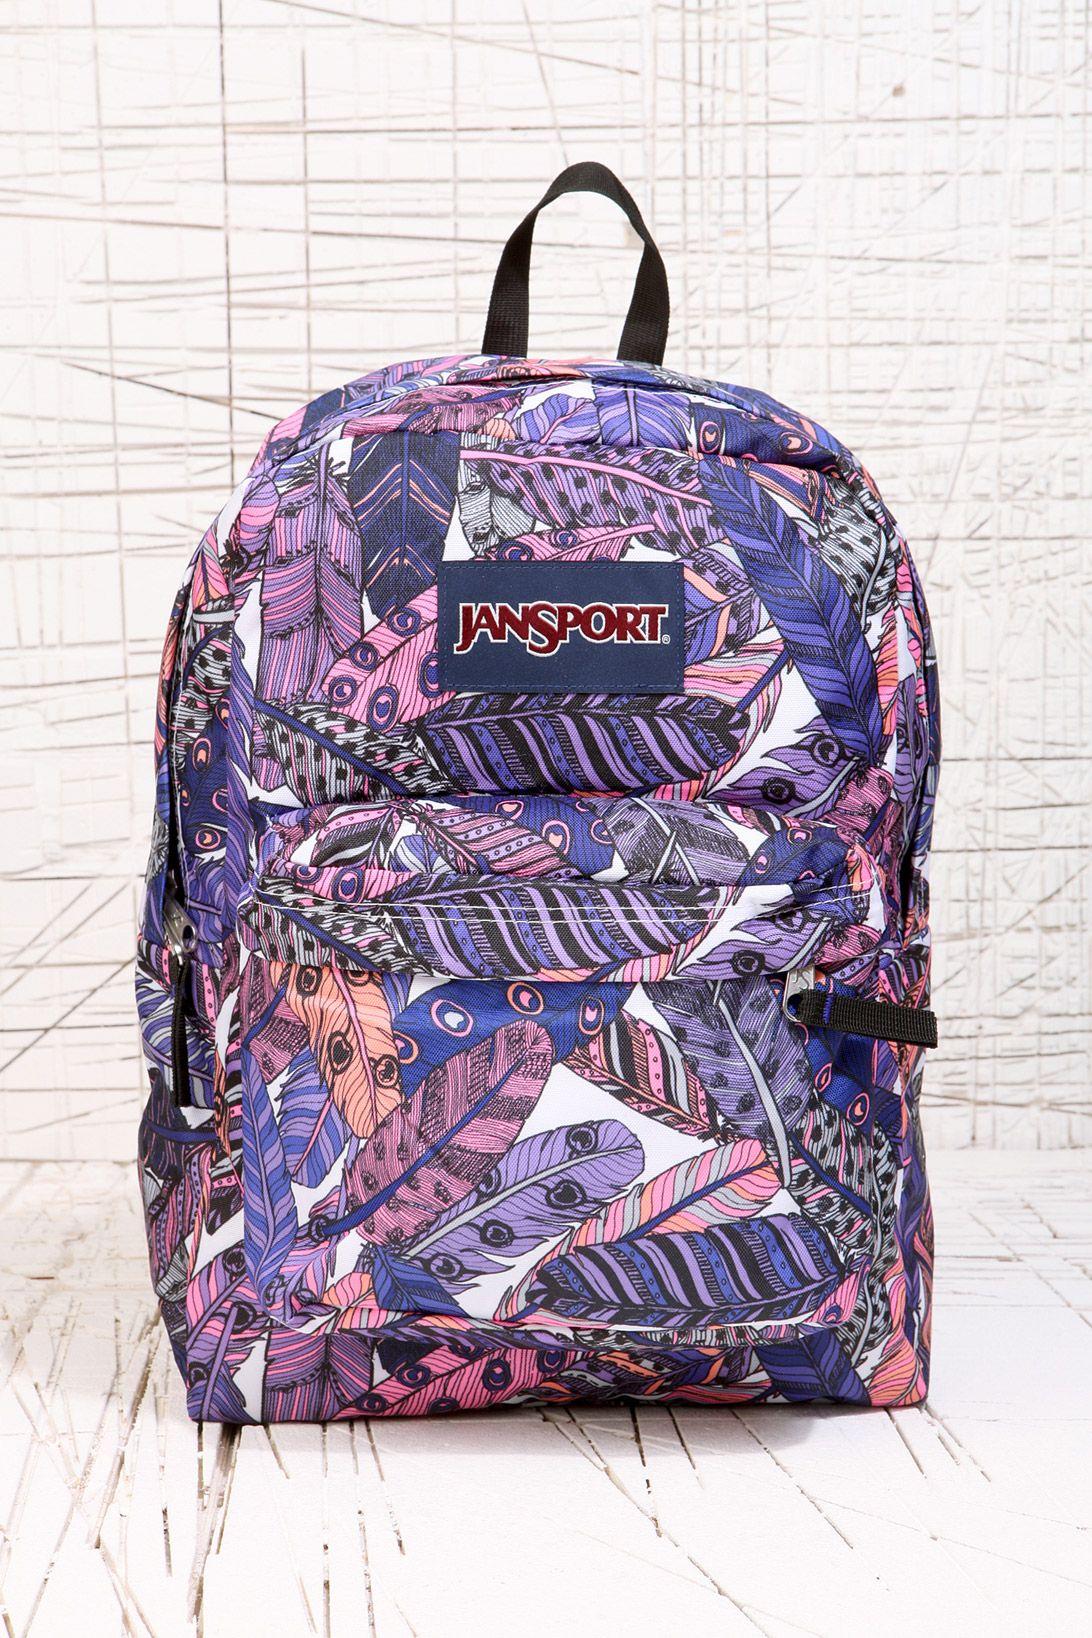 Feather Print Jansport Backpack I Want Cheapegoodbags Mk